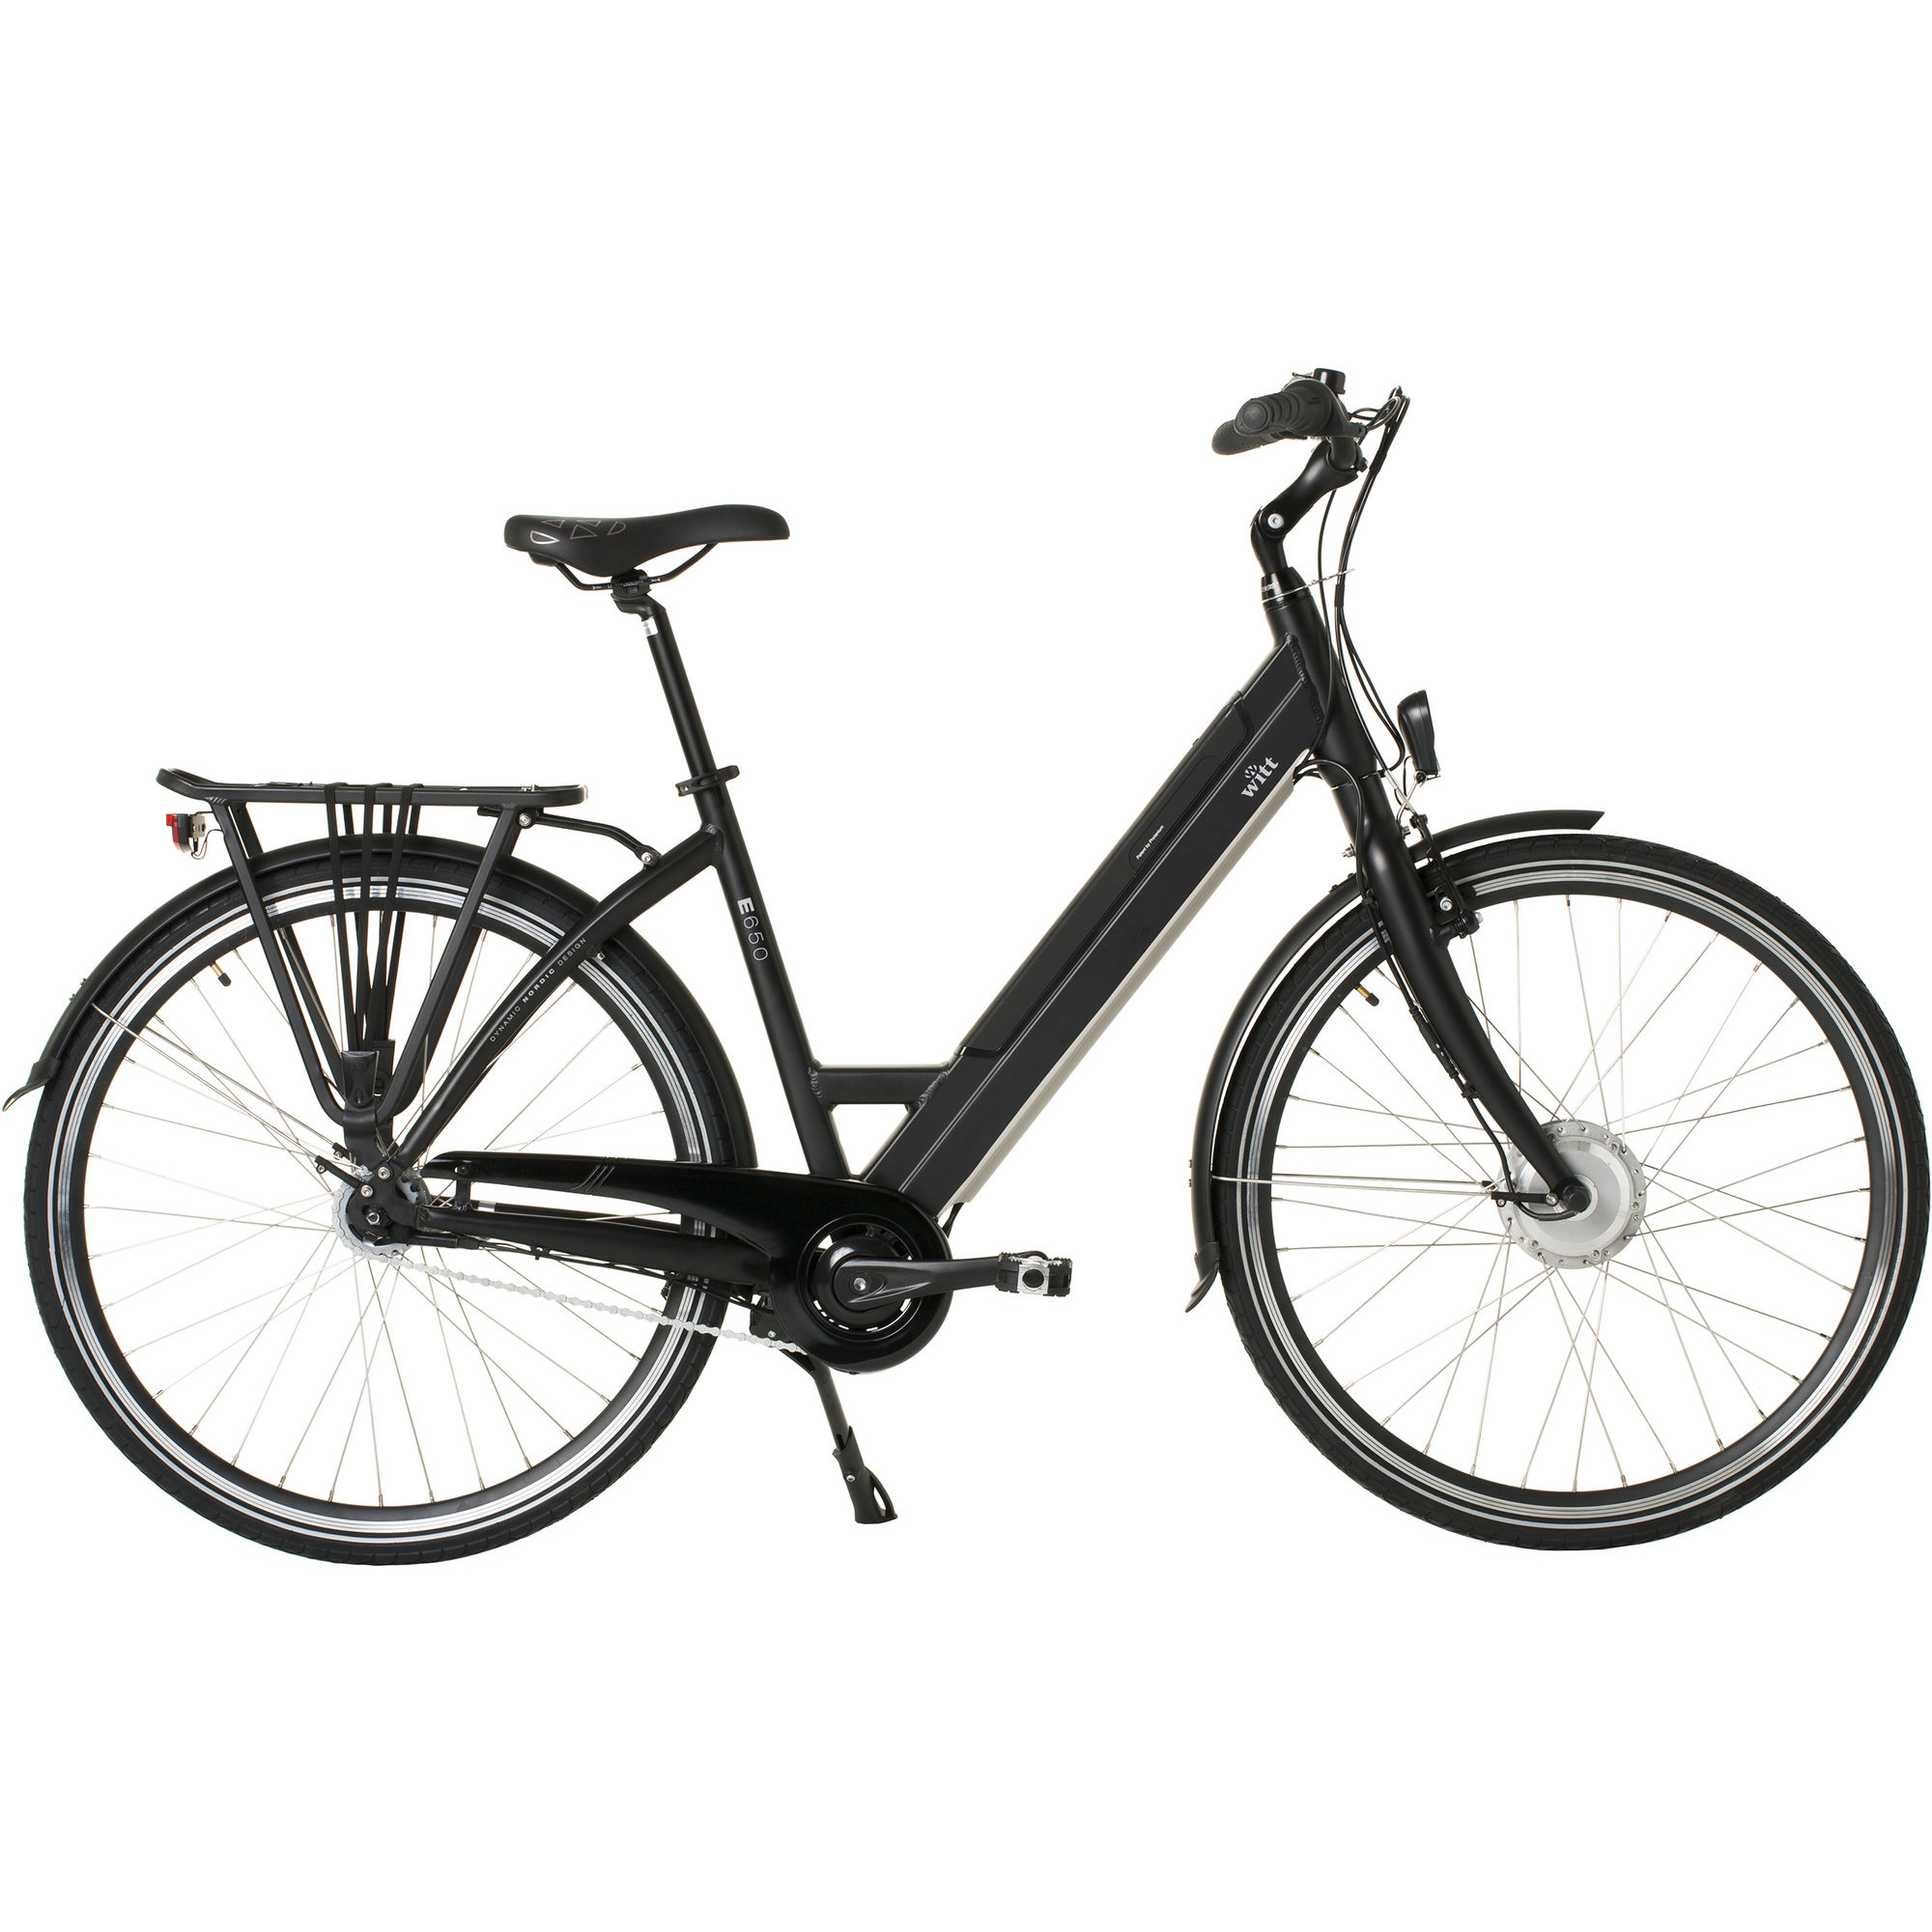 Witt E-bike E650 EL-sykkel, dame